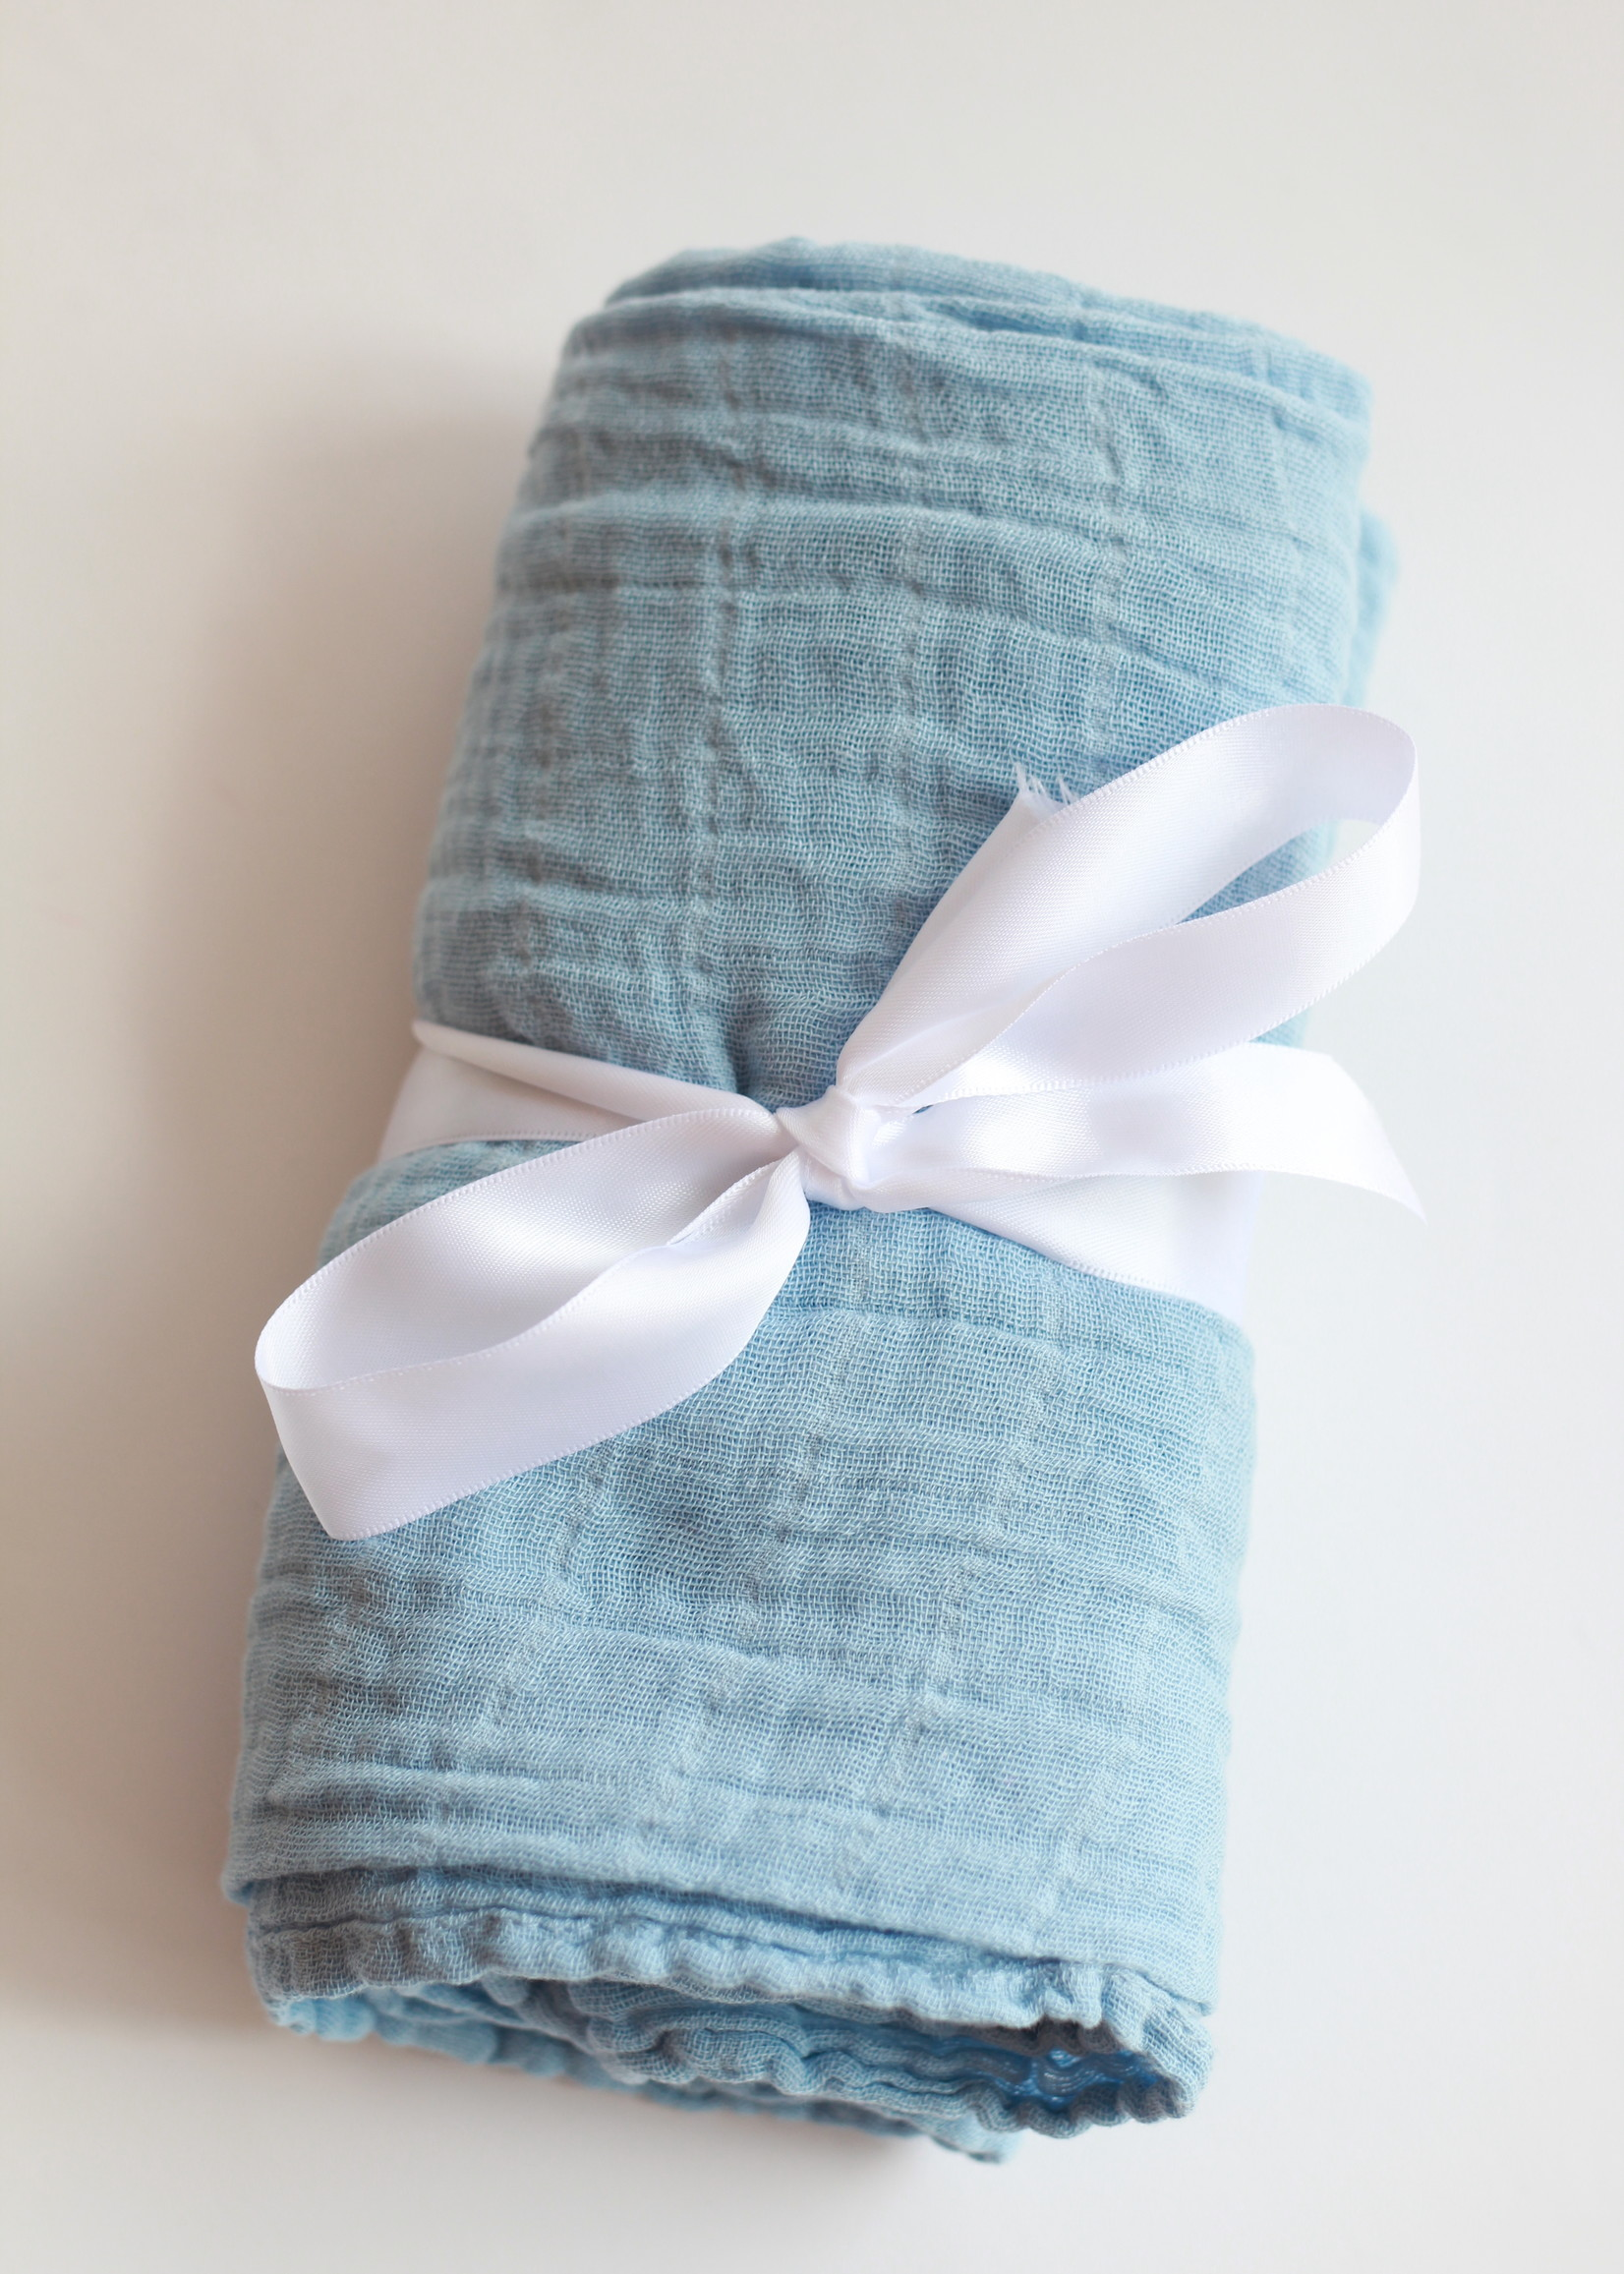 Bebe Au Lait Cornflower Classic Muslin Swaddle Blanket